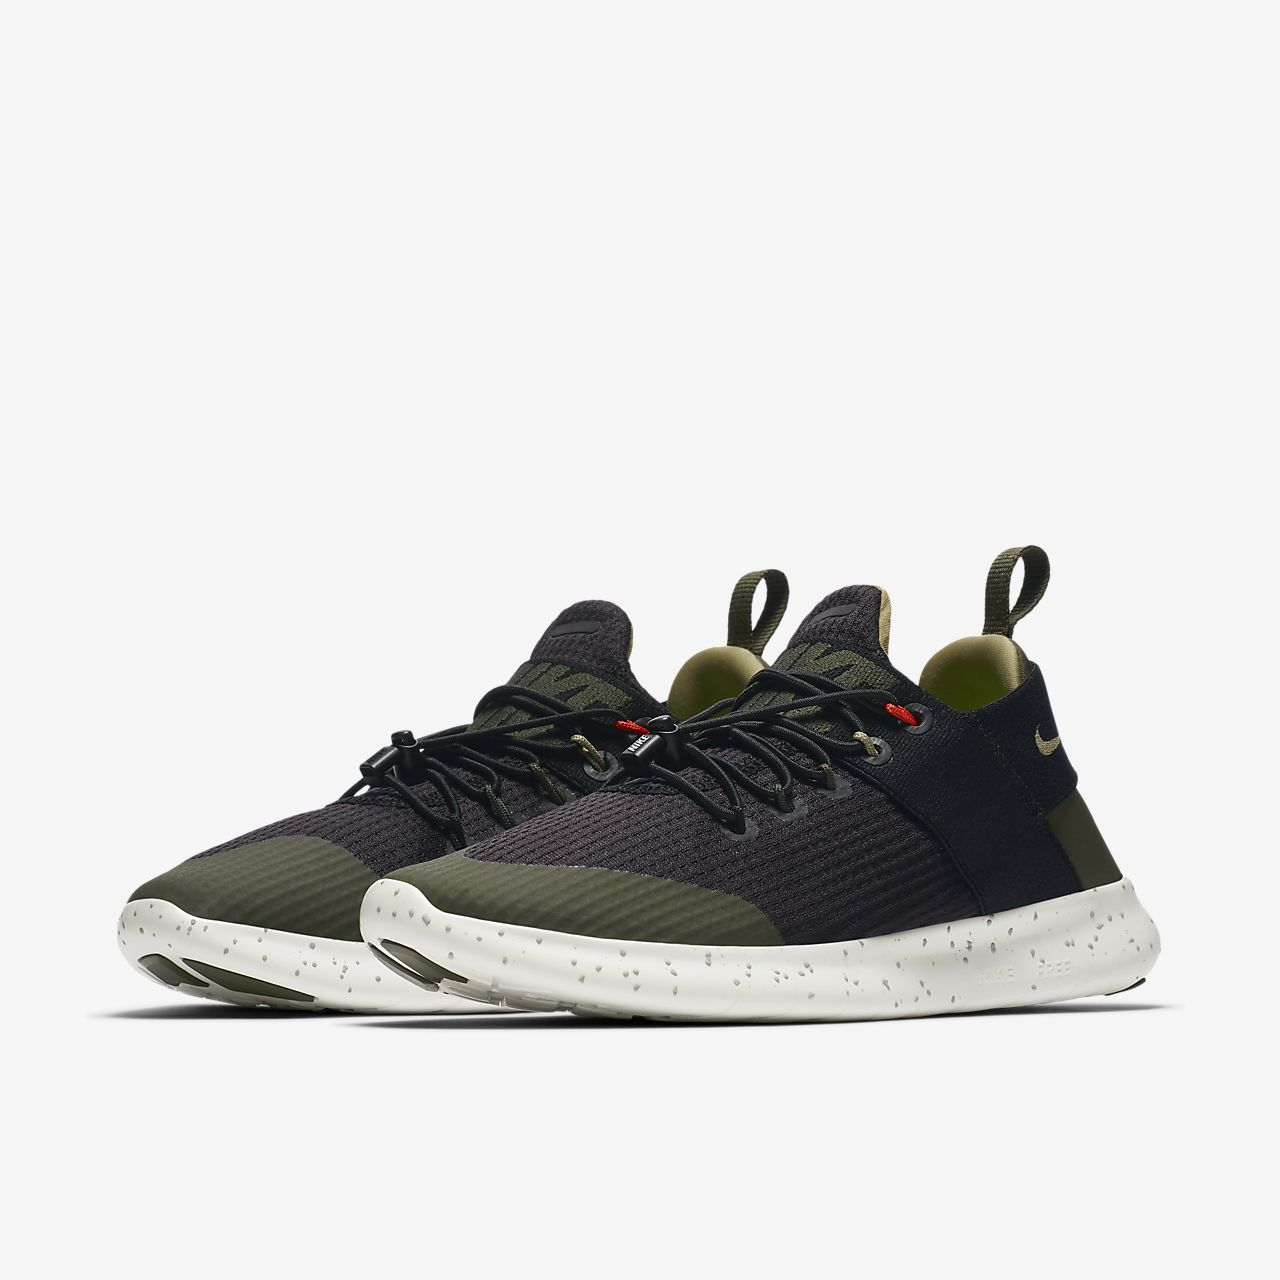 Nike Free Utilitaire De Banlieue